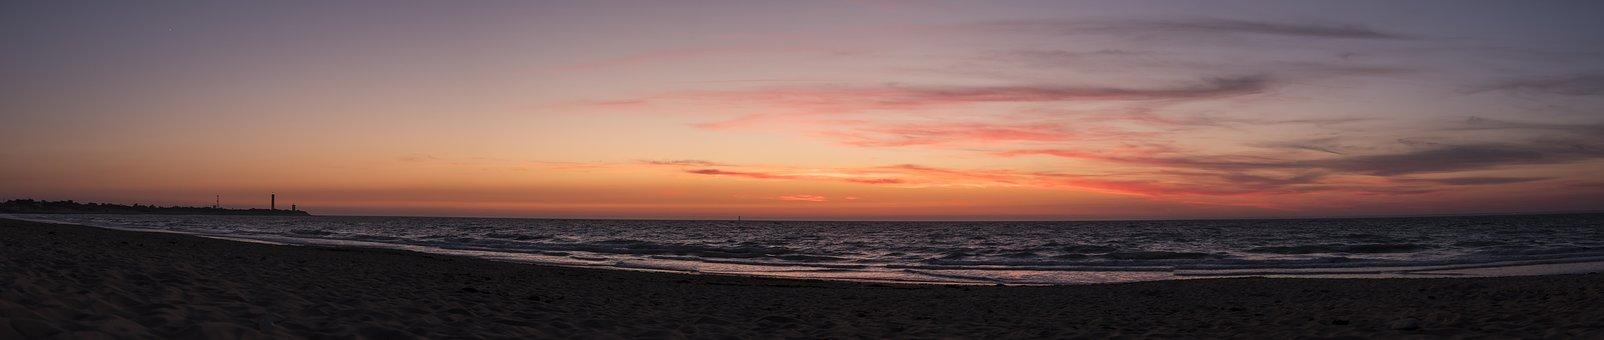 Il De Re, France, Beach, Sunset, Sea, Sand